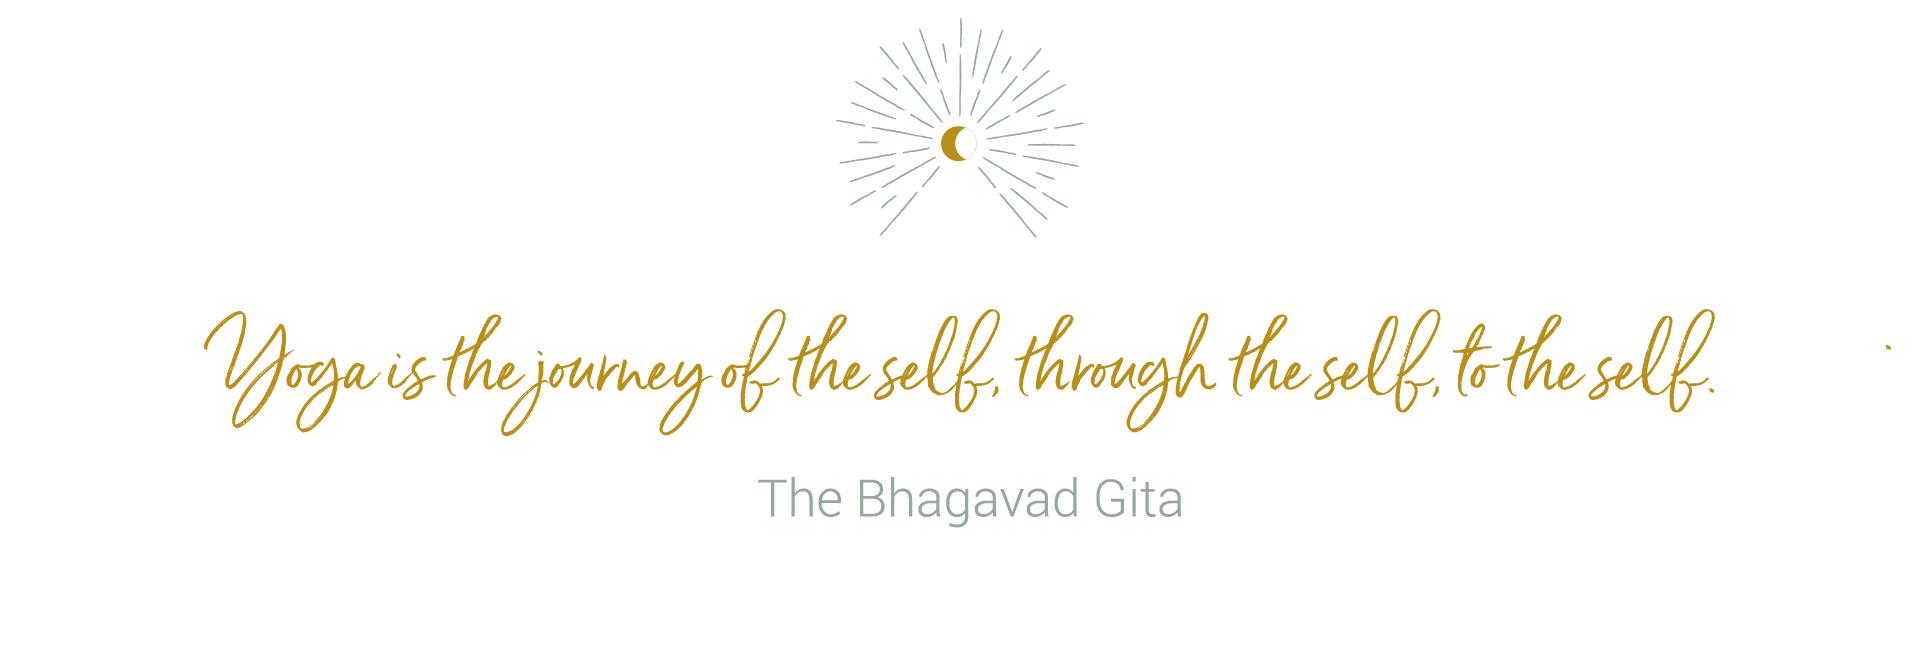 Yoga is the journey of the self, through the self, to the self. The Bhagavad Gita - Niyama